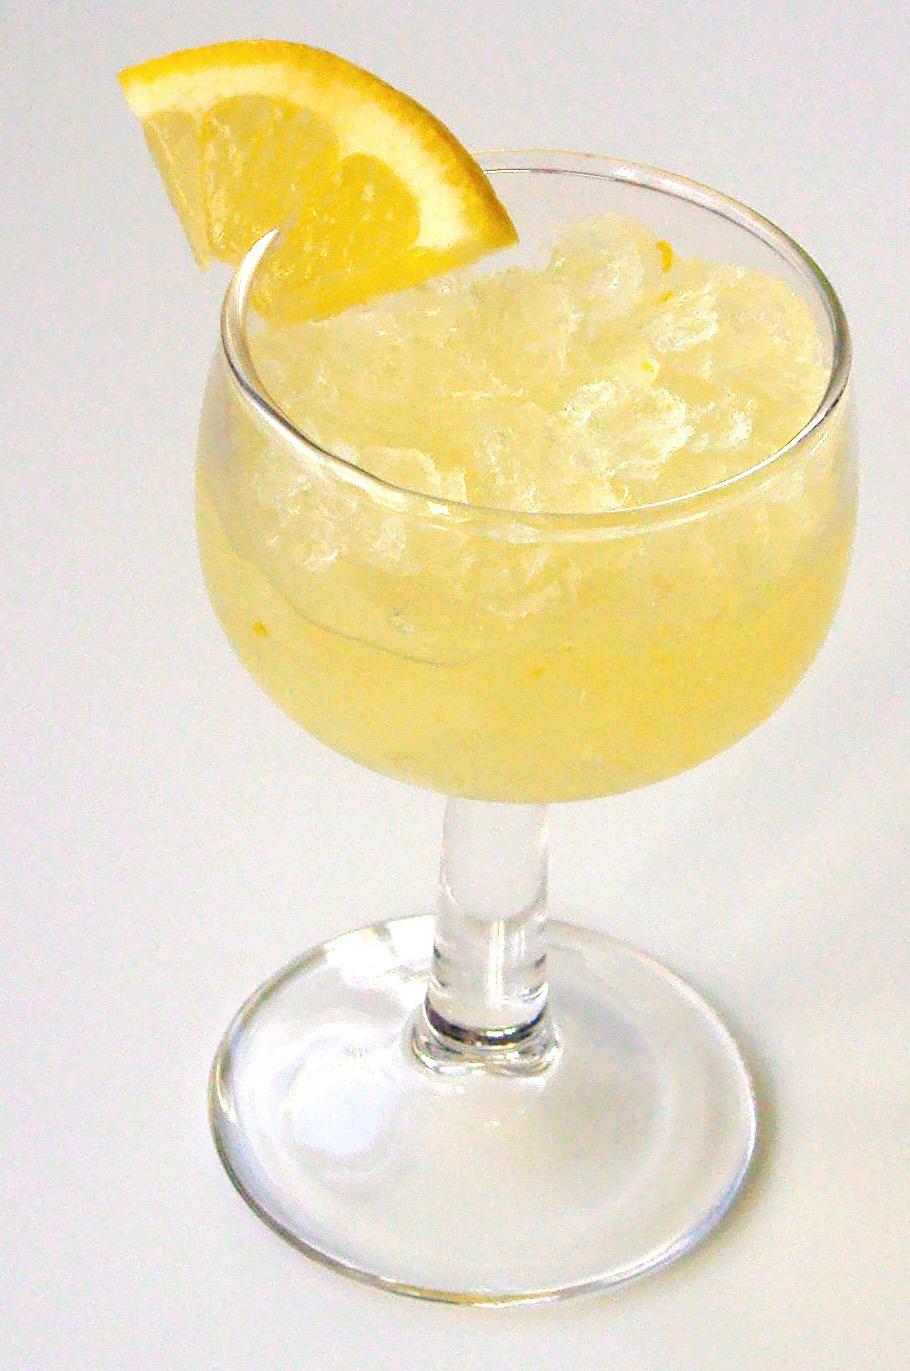 ... granita when life gives you lemons make lemon granita food lover s